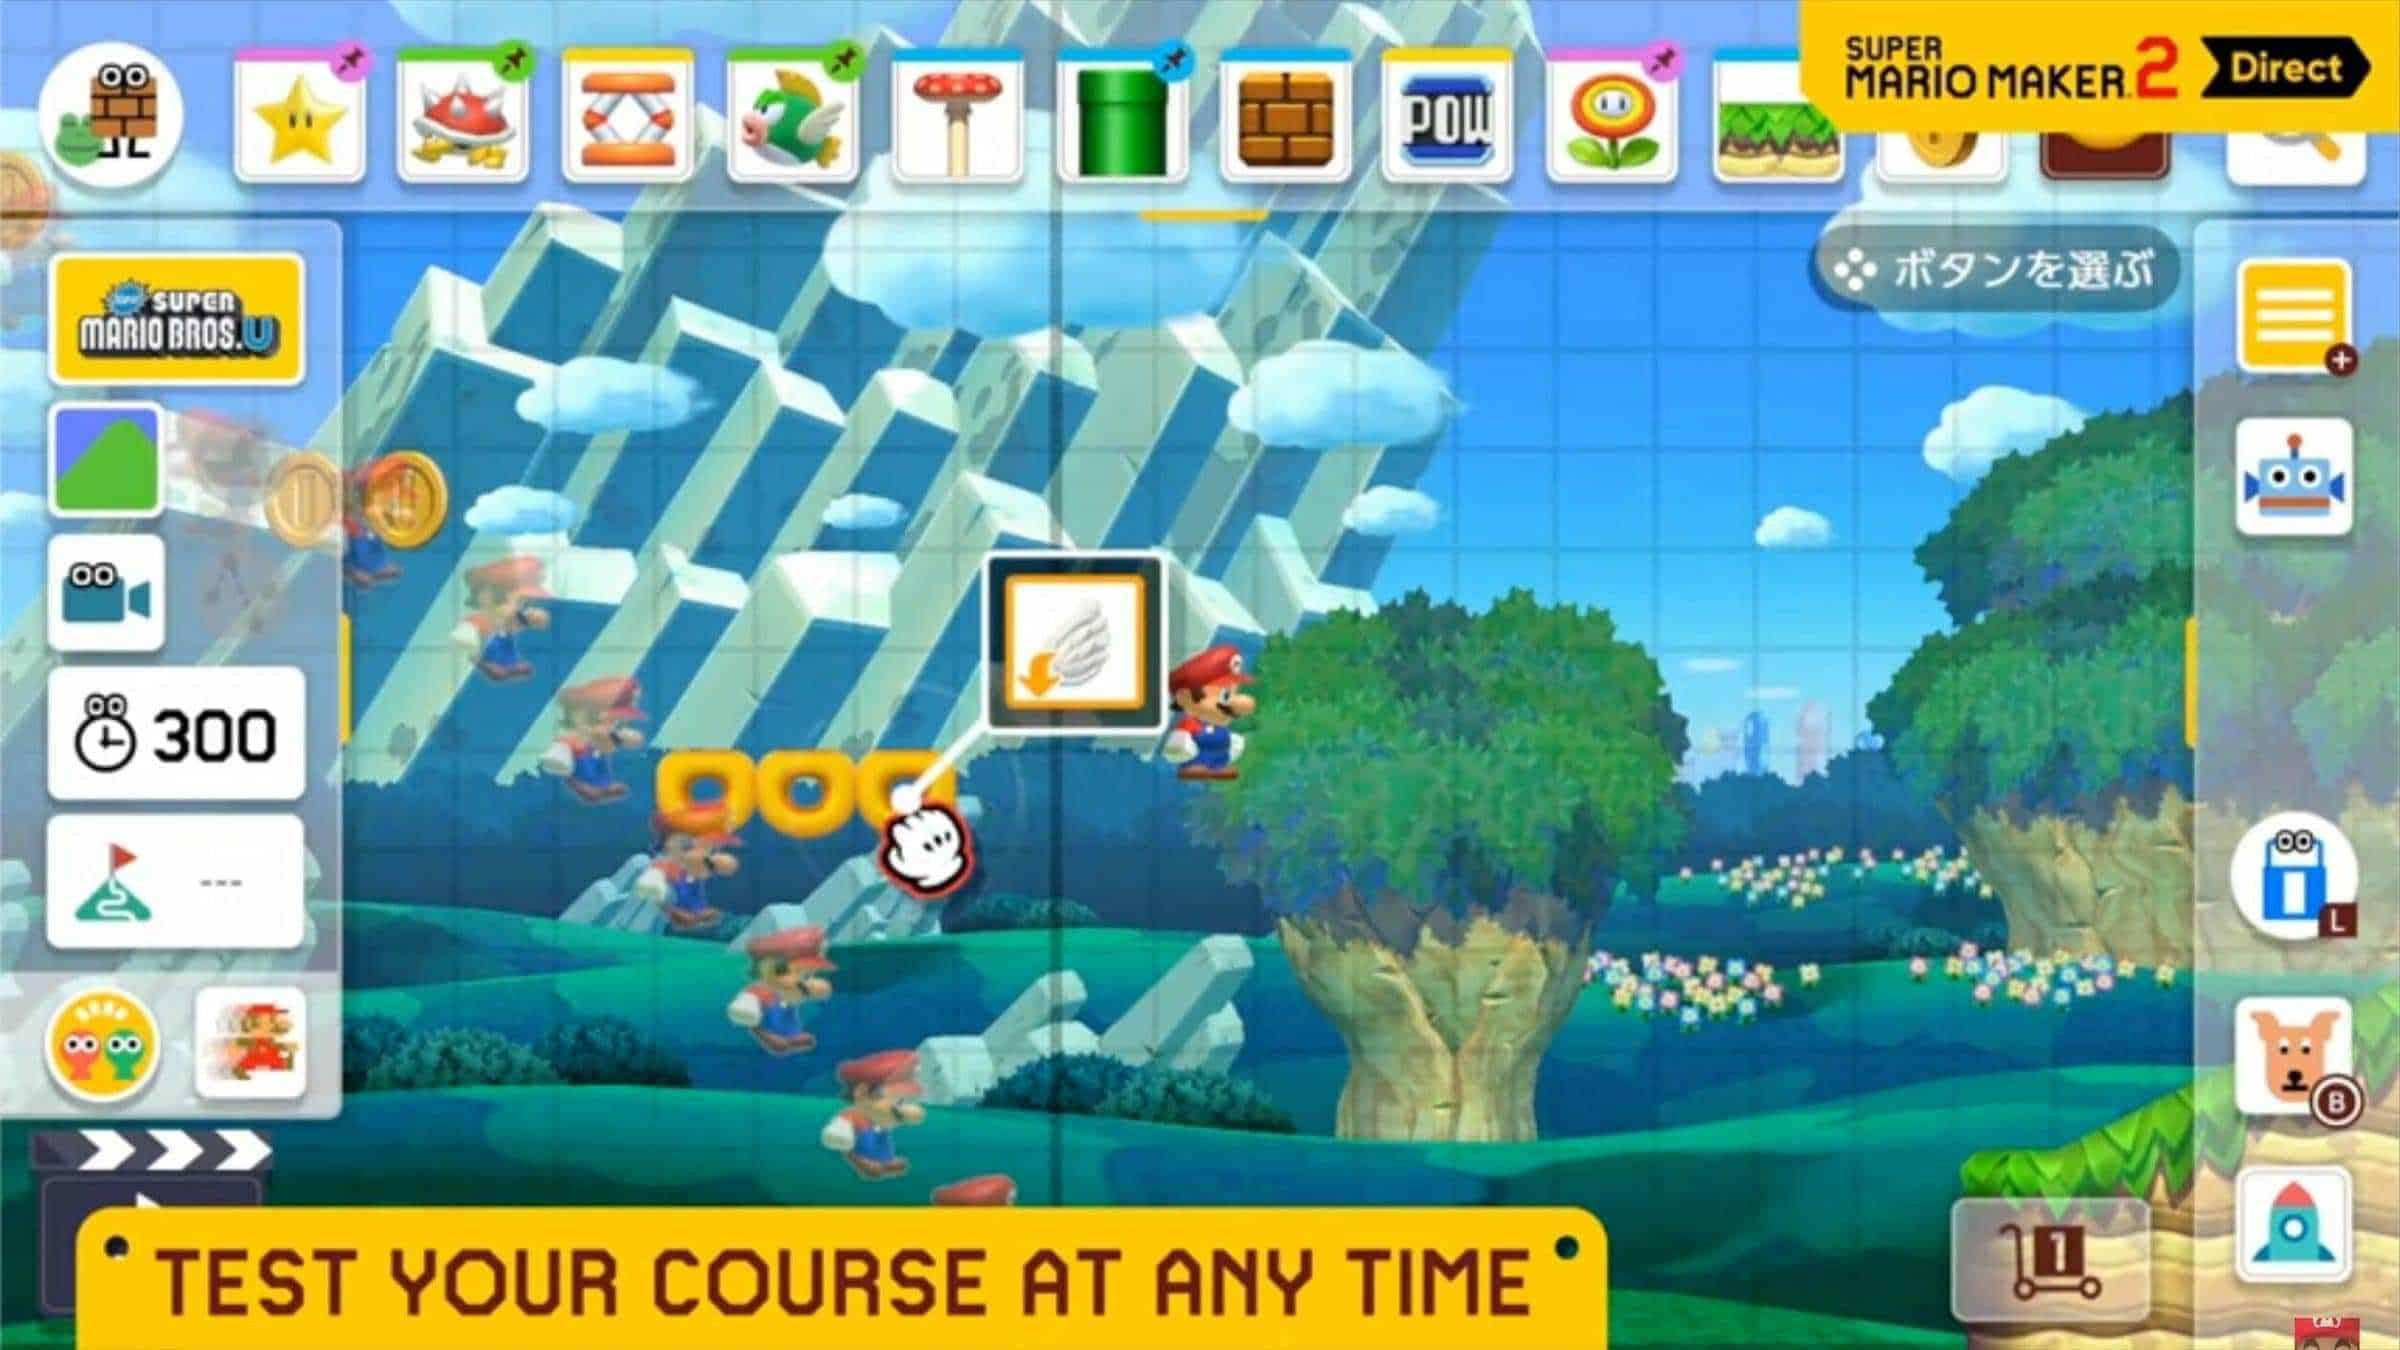 Super Mario Maker 2 Editor JPG Screenshot YT Techgarage